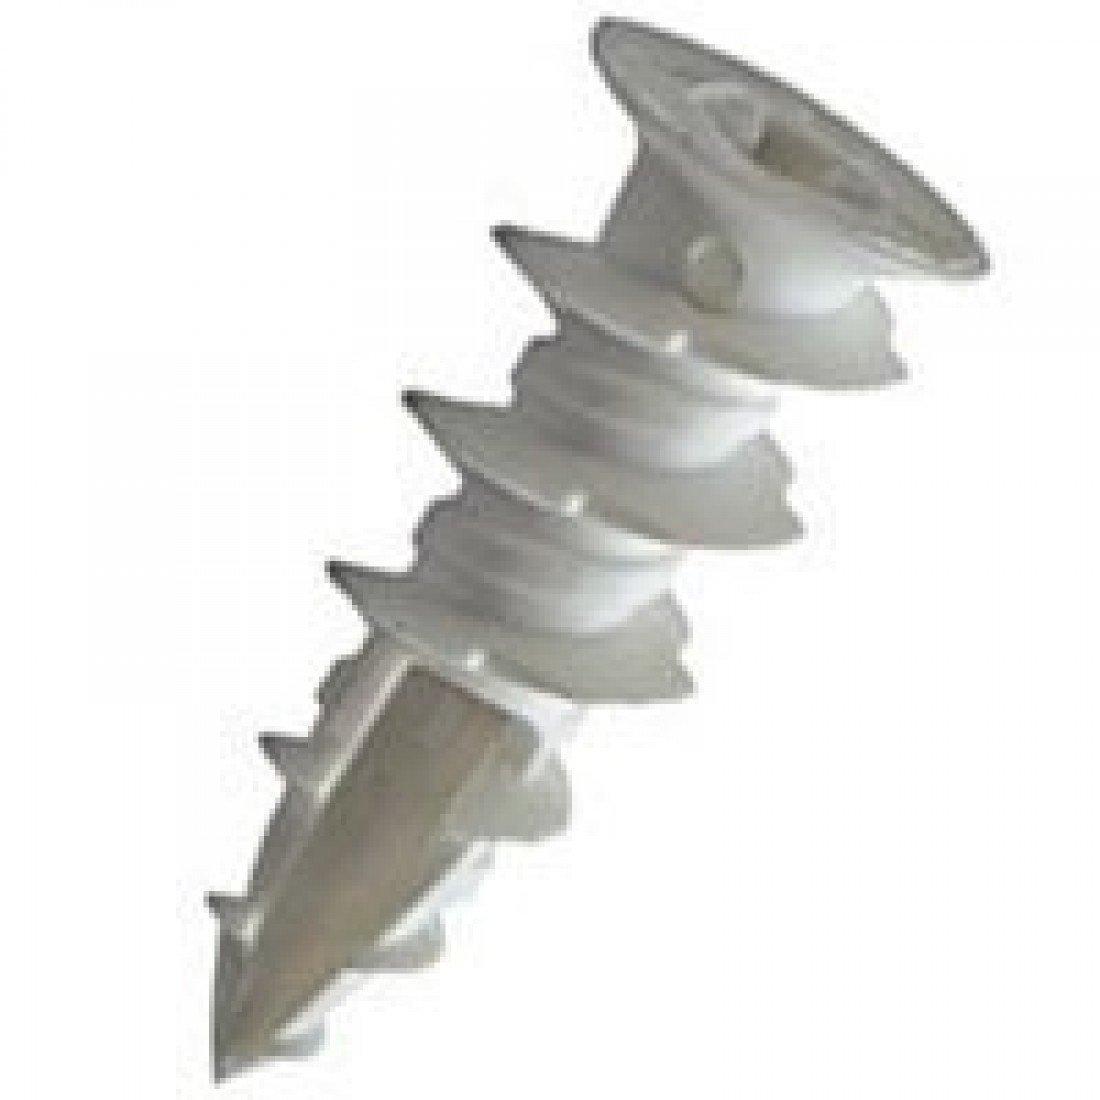 1//4-Inch-20 TPI by 1-1//2-Inch Length 100-Pack L.H Dottie MBS14112 Cap Screw 7//16-Inch Hex Hex Head